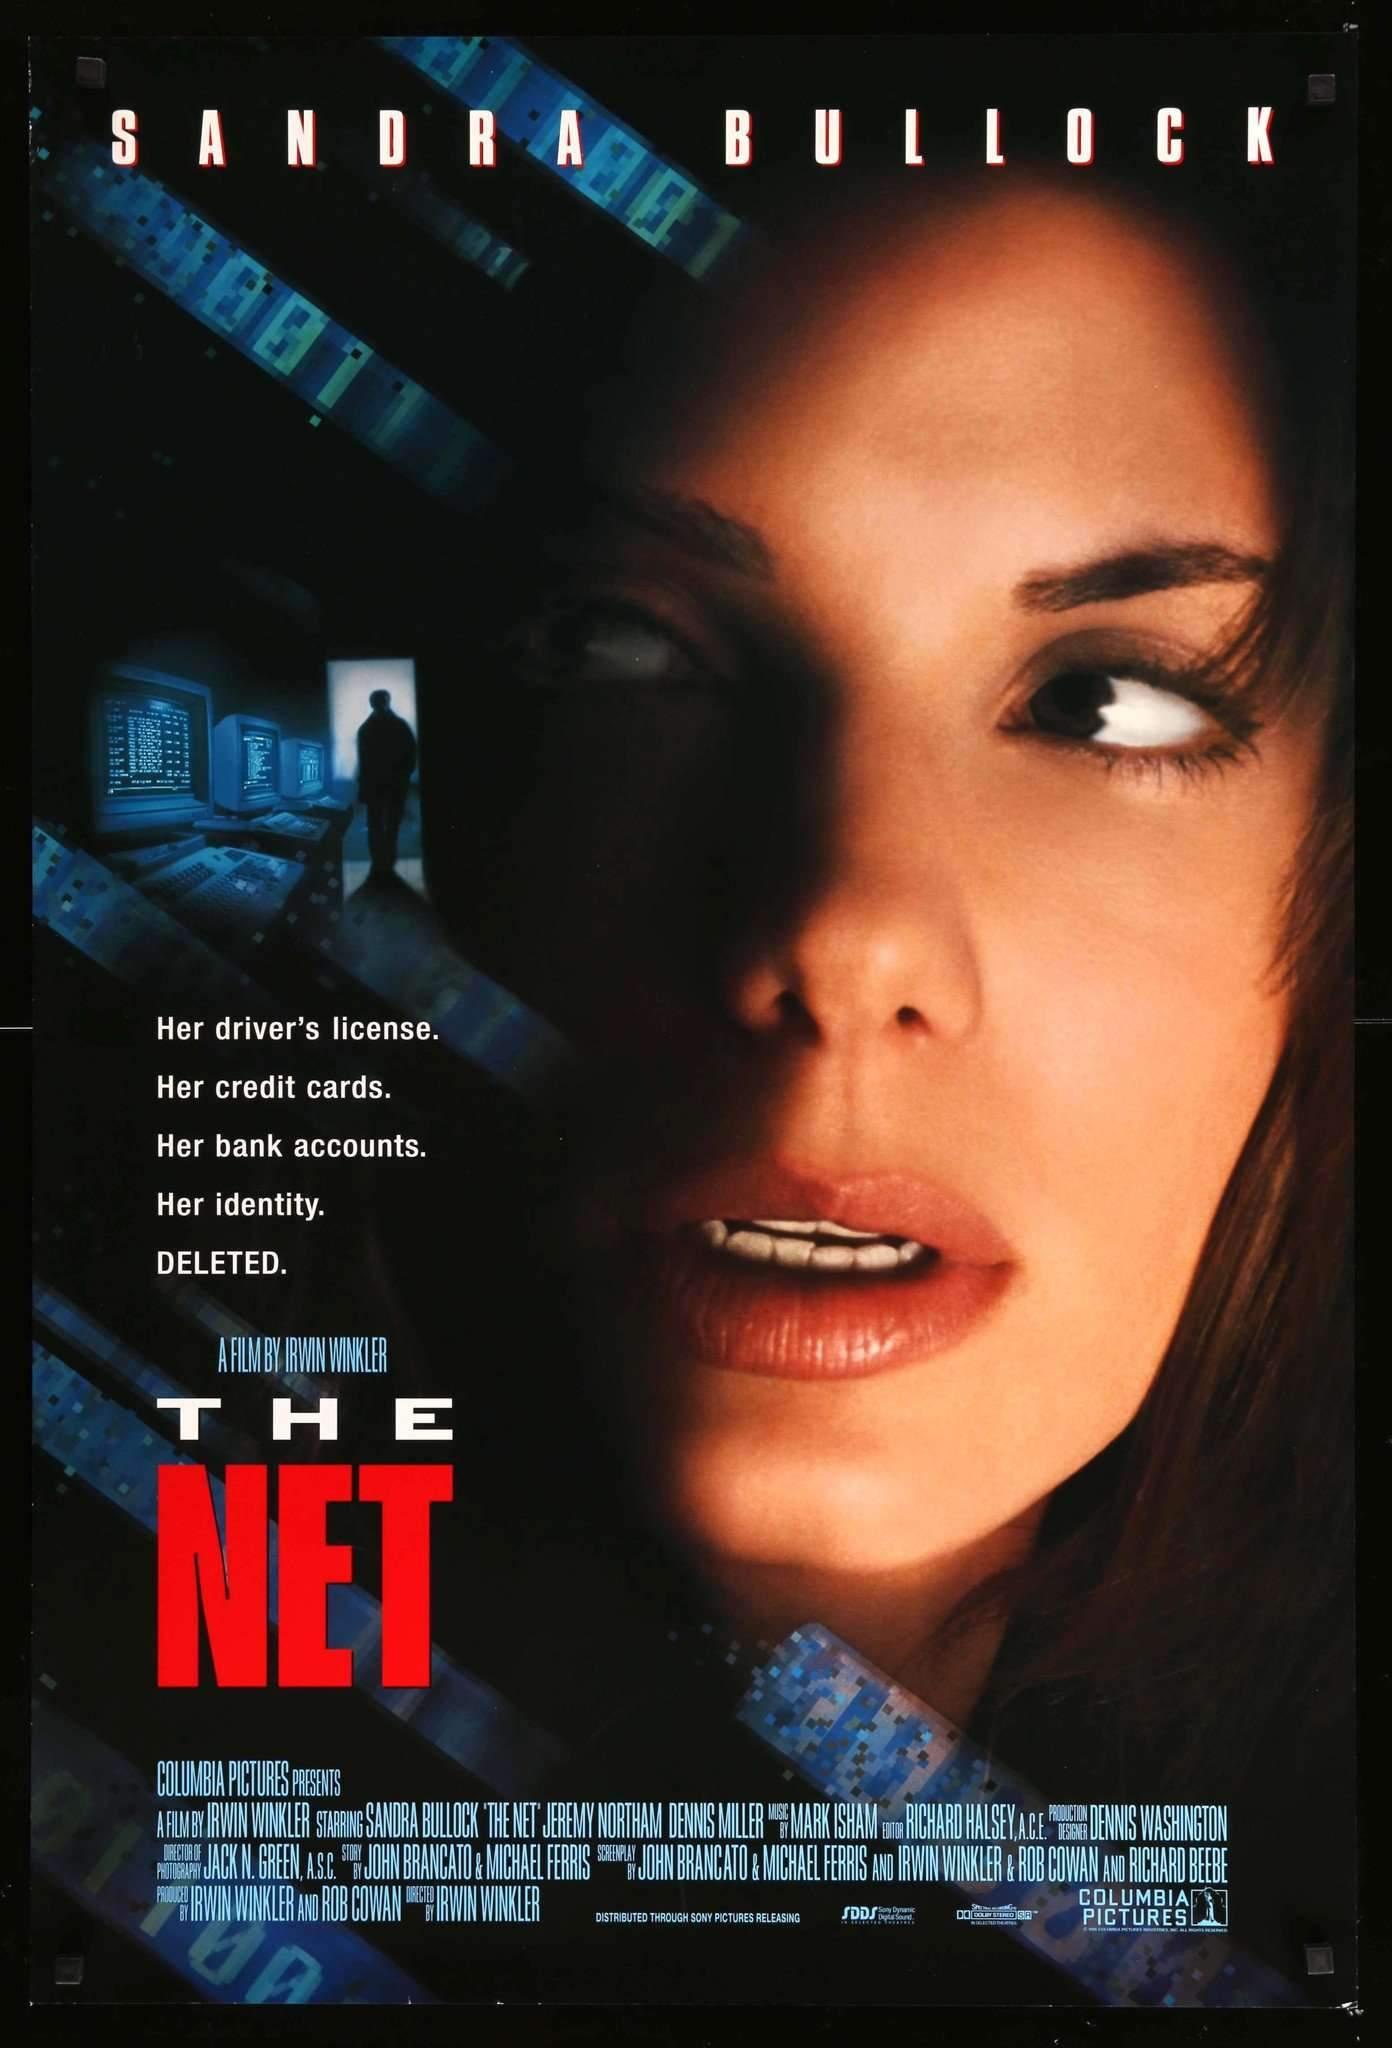 The_Net_original_film_art_1_spo_5000x.jpg